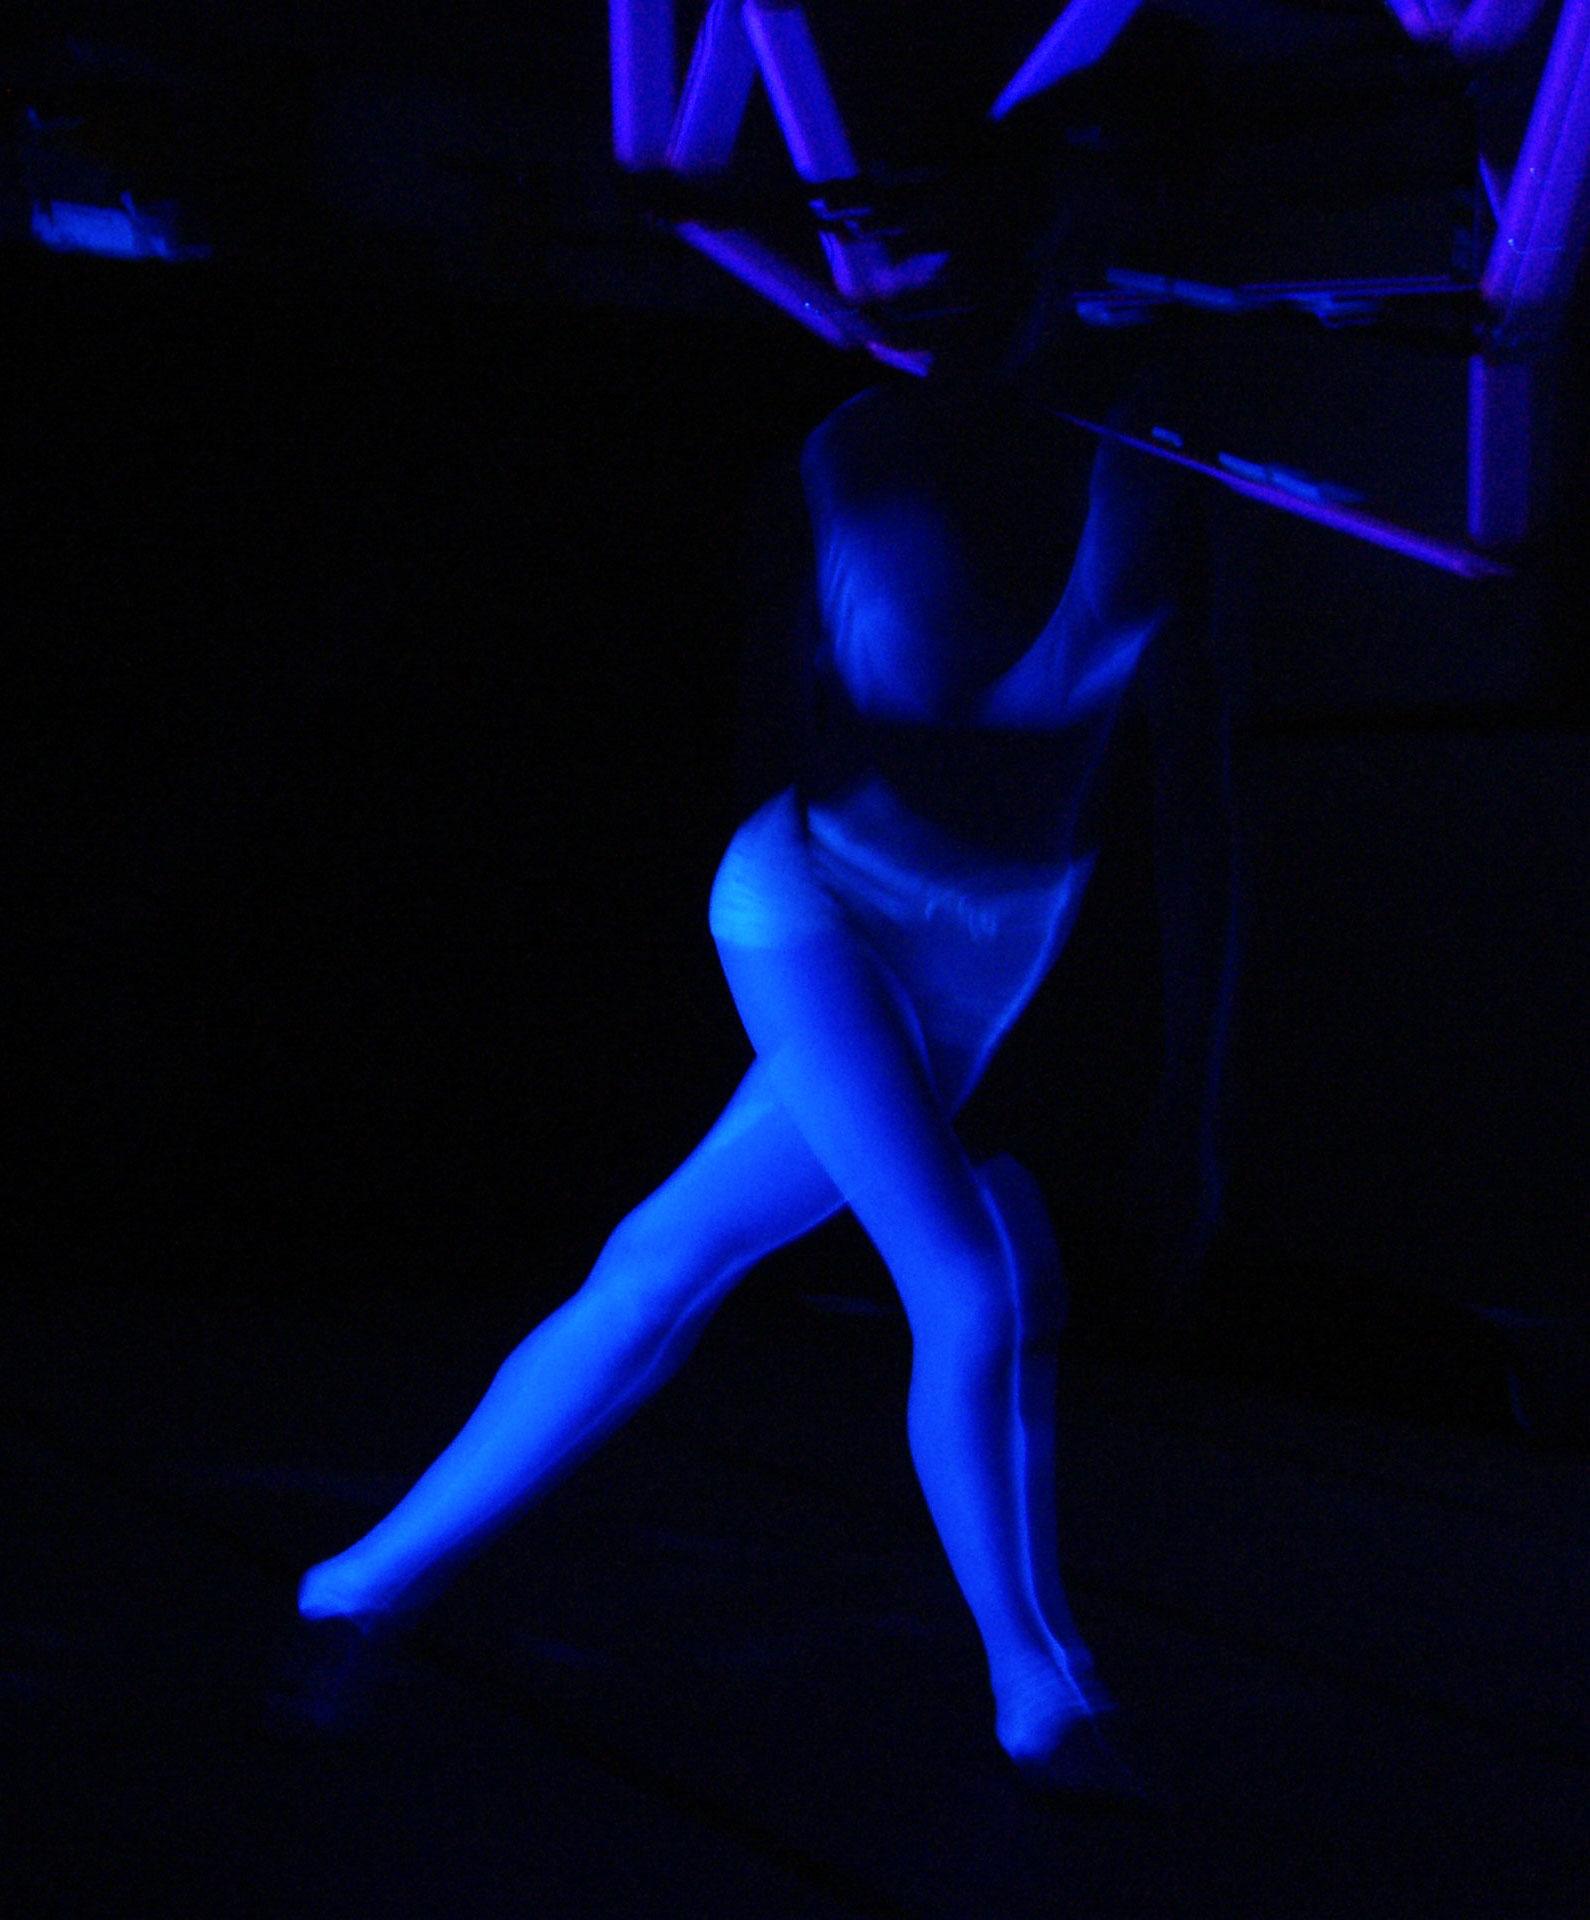 Dancing under blacklight